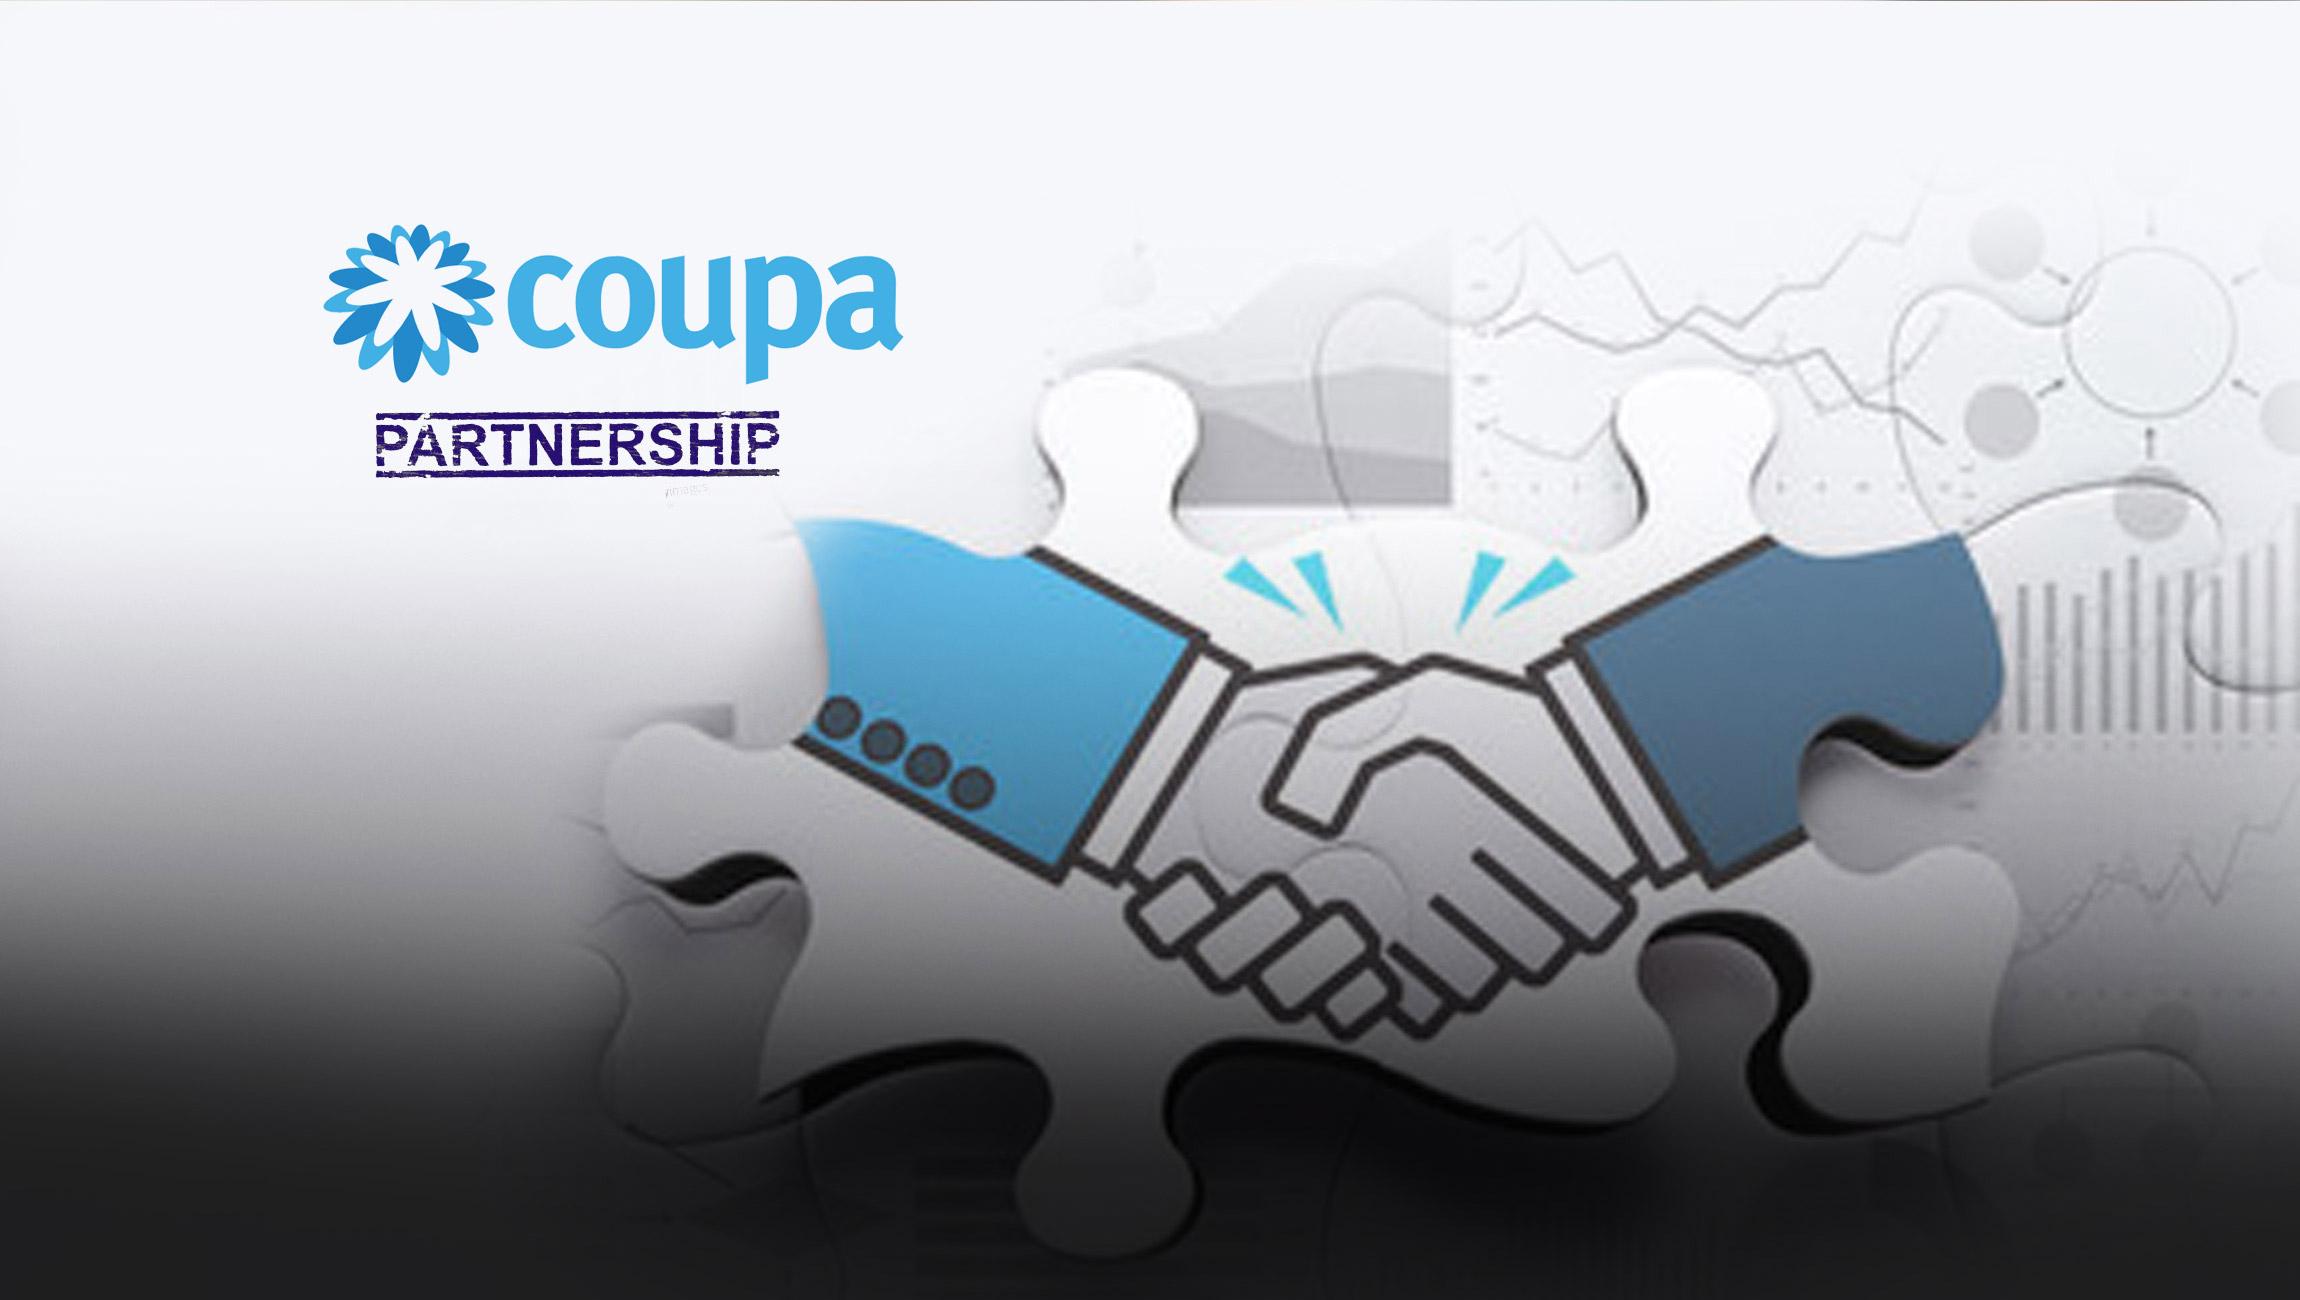 Coupa Announces Strategic Partnership with Japan Cloud to Establish Coupa K.K.